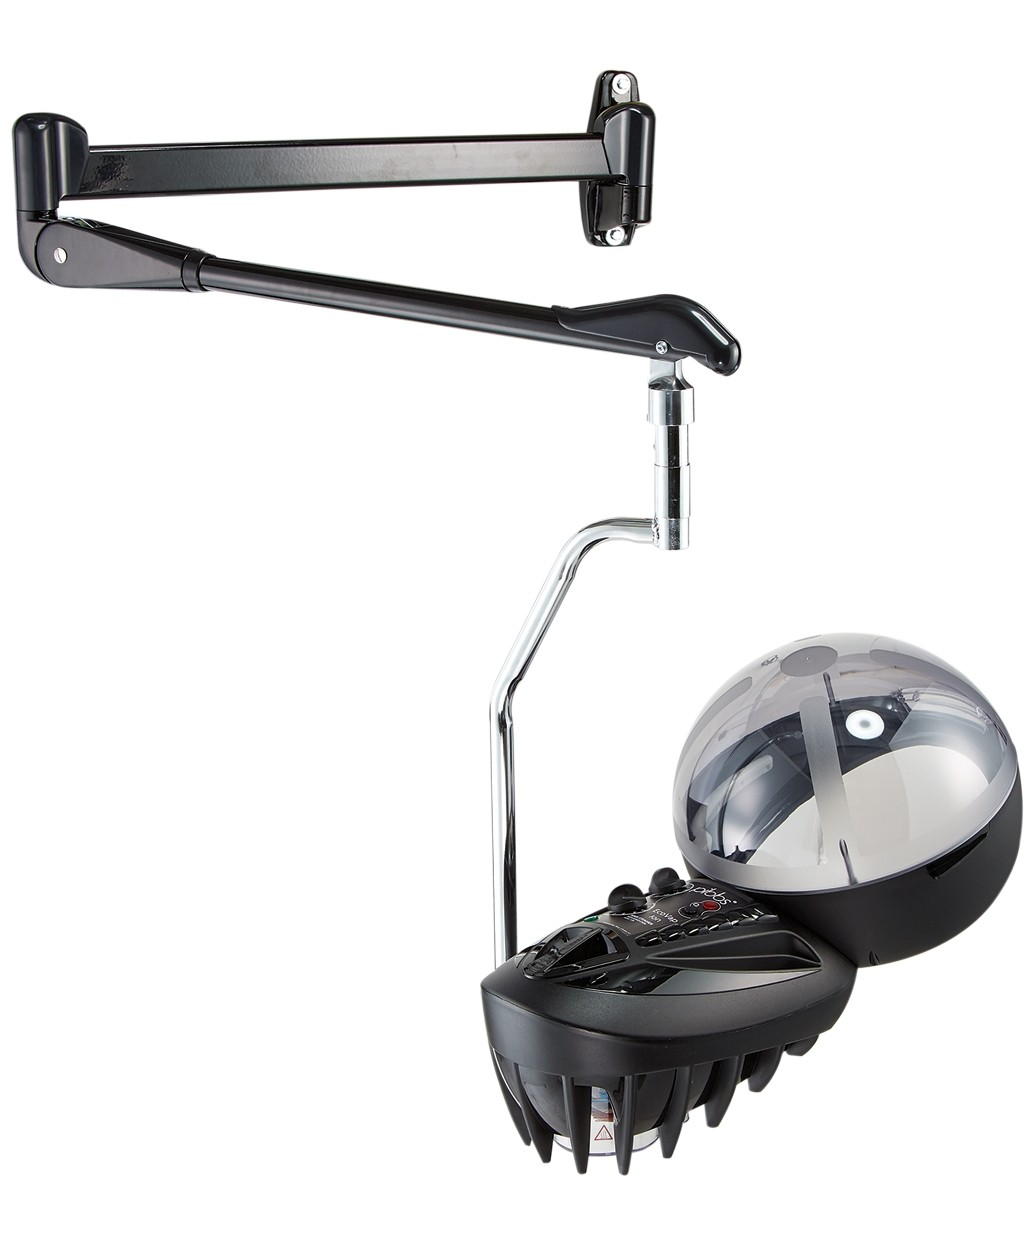 Pibbs 129 EcoVap Ion Professional Hair Steamer w/ Wall Mount